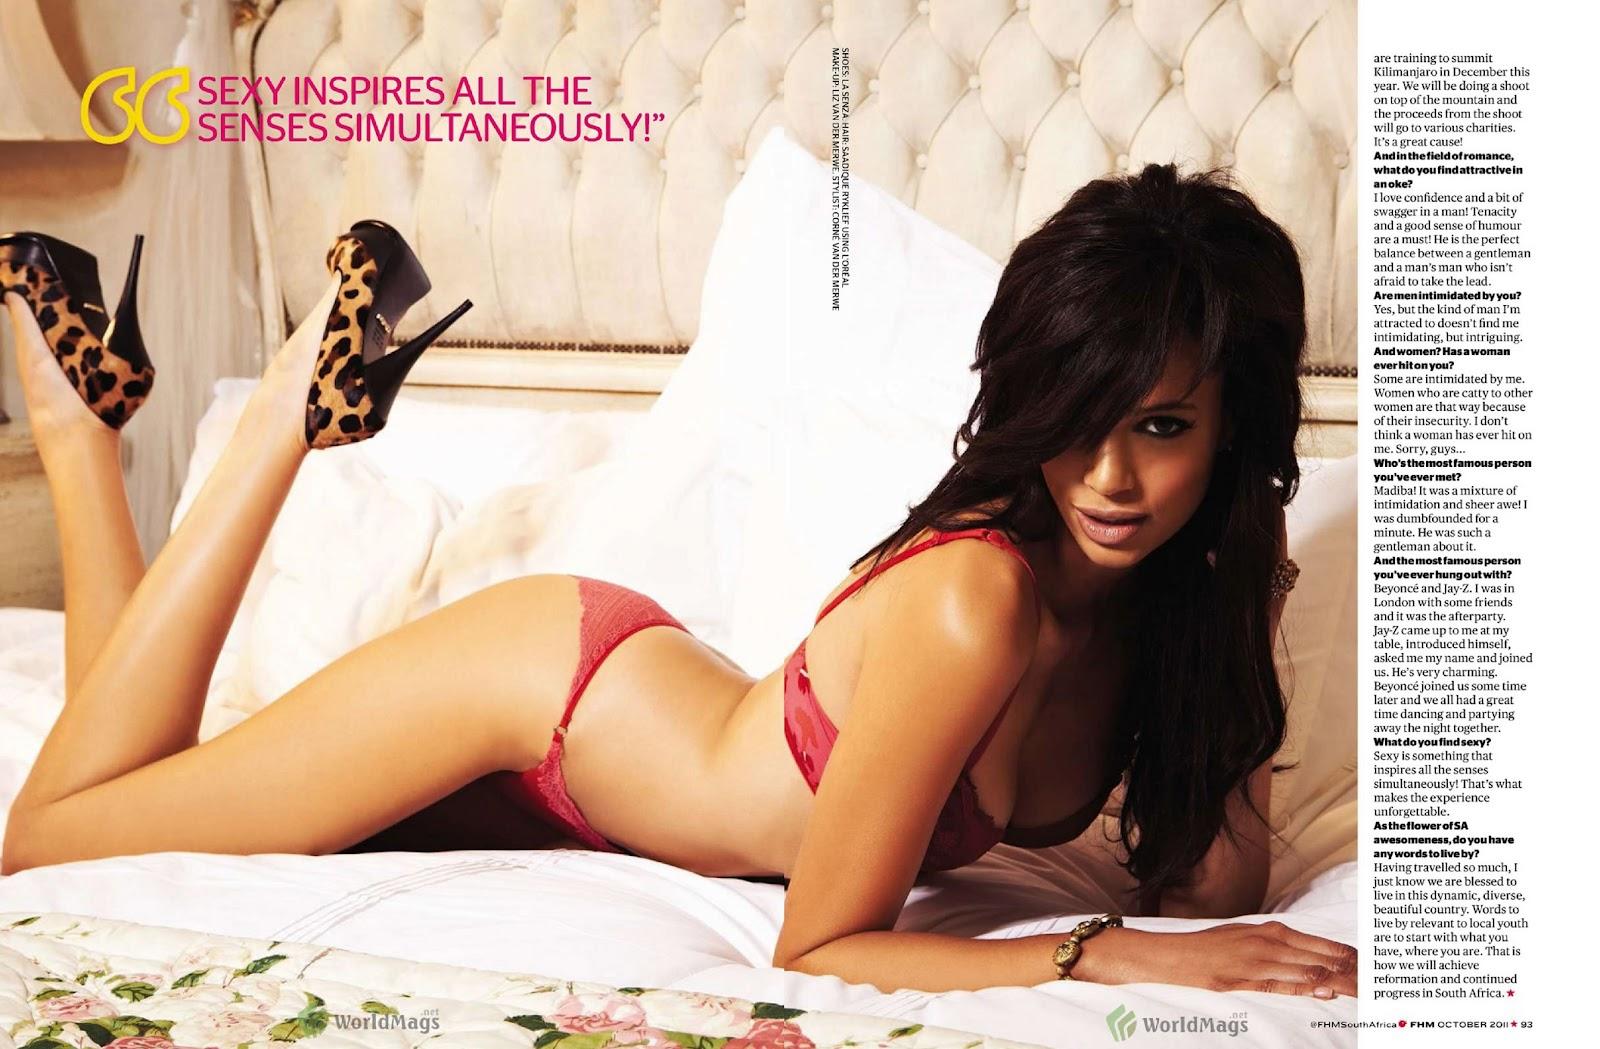 Megan fox tops fhm's sexiest women list